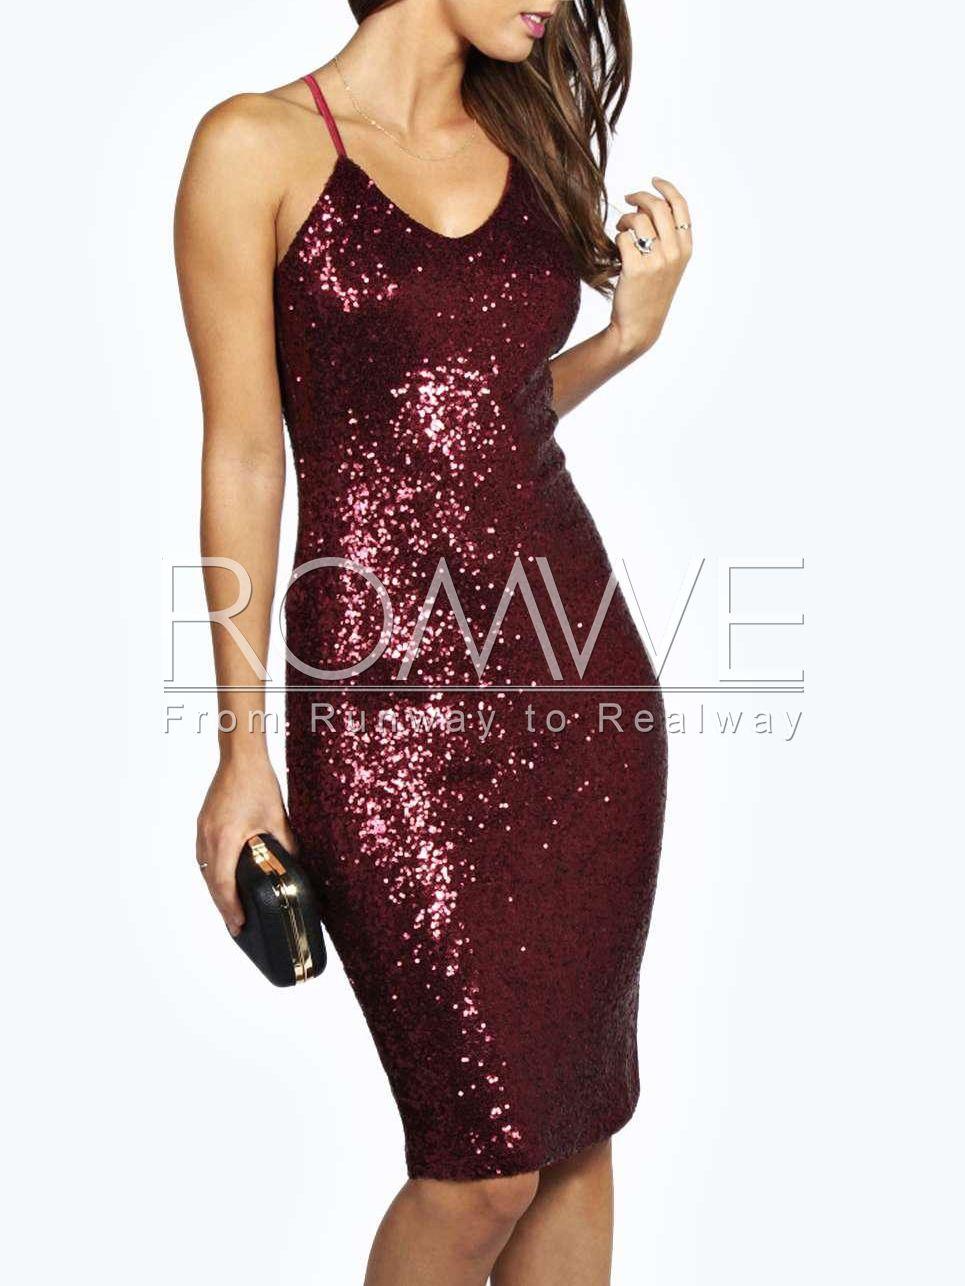 c04afe90fd0 Burgundy Spaghetti Strap Sequined Dress 15.99